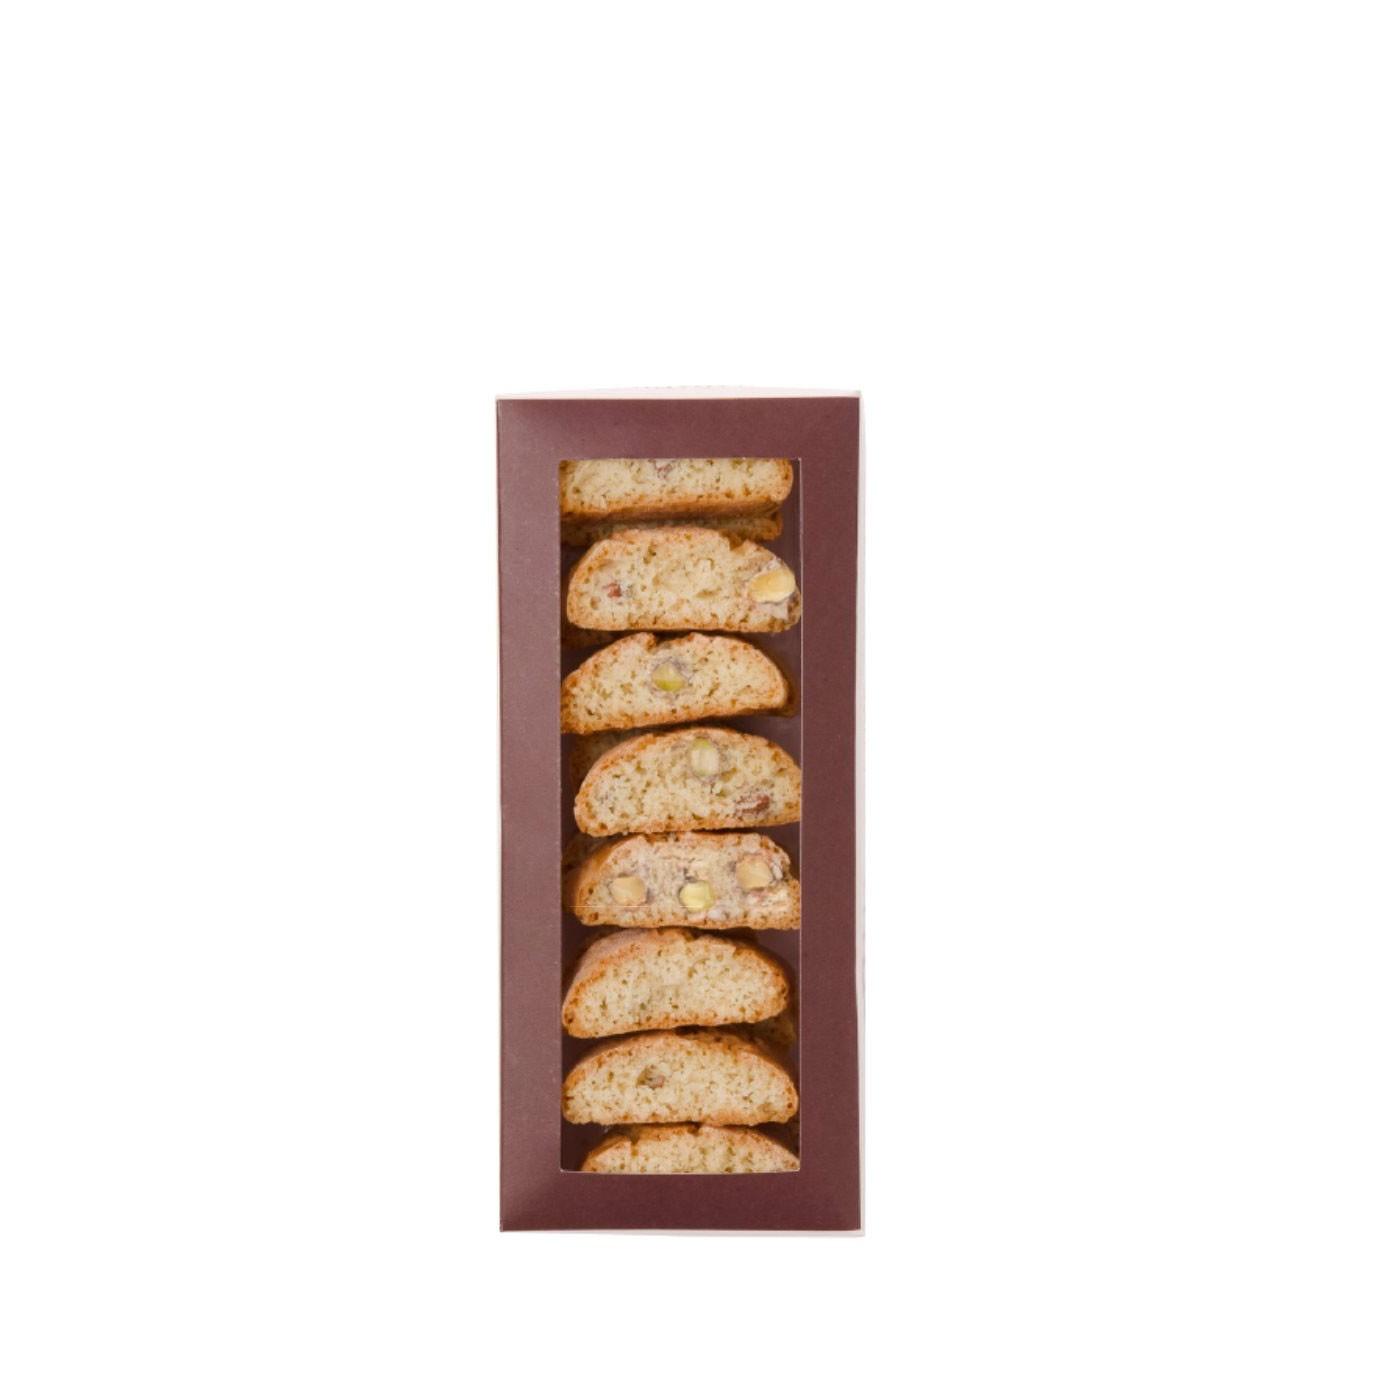 Pistachio Cantucci Cookies 4.23 oz